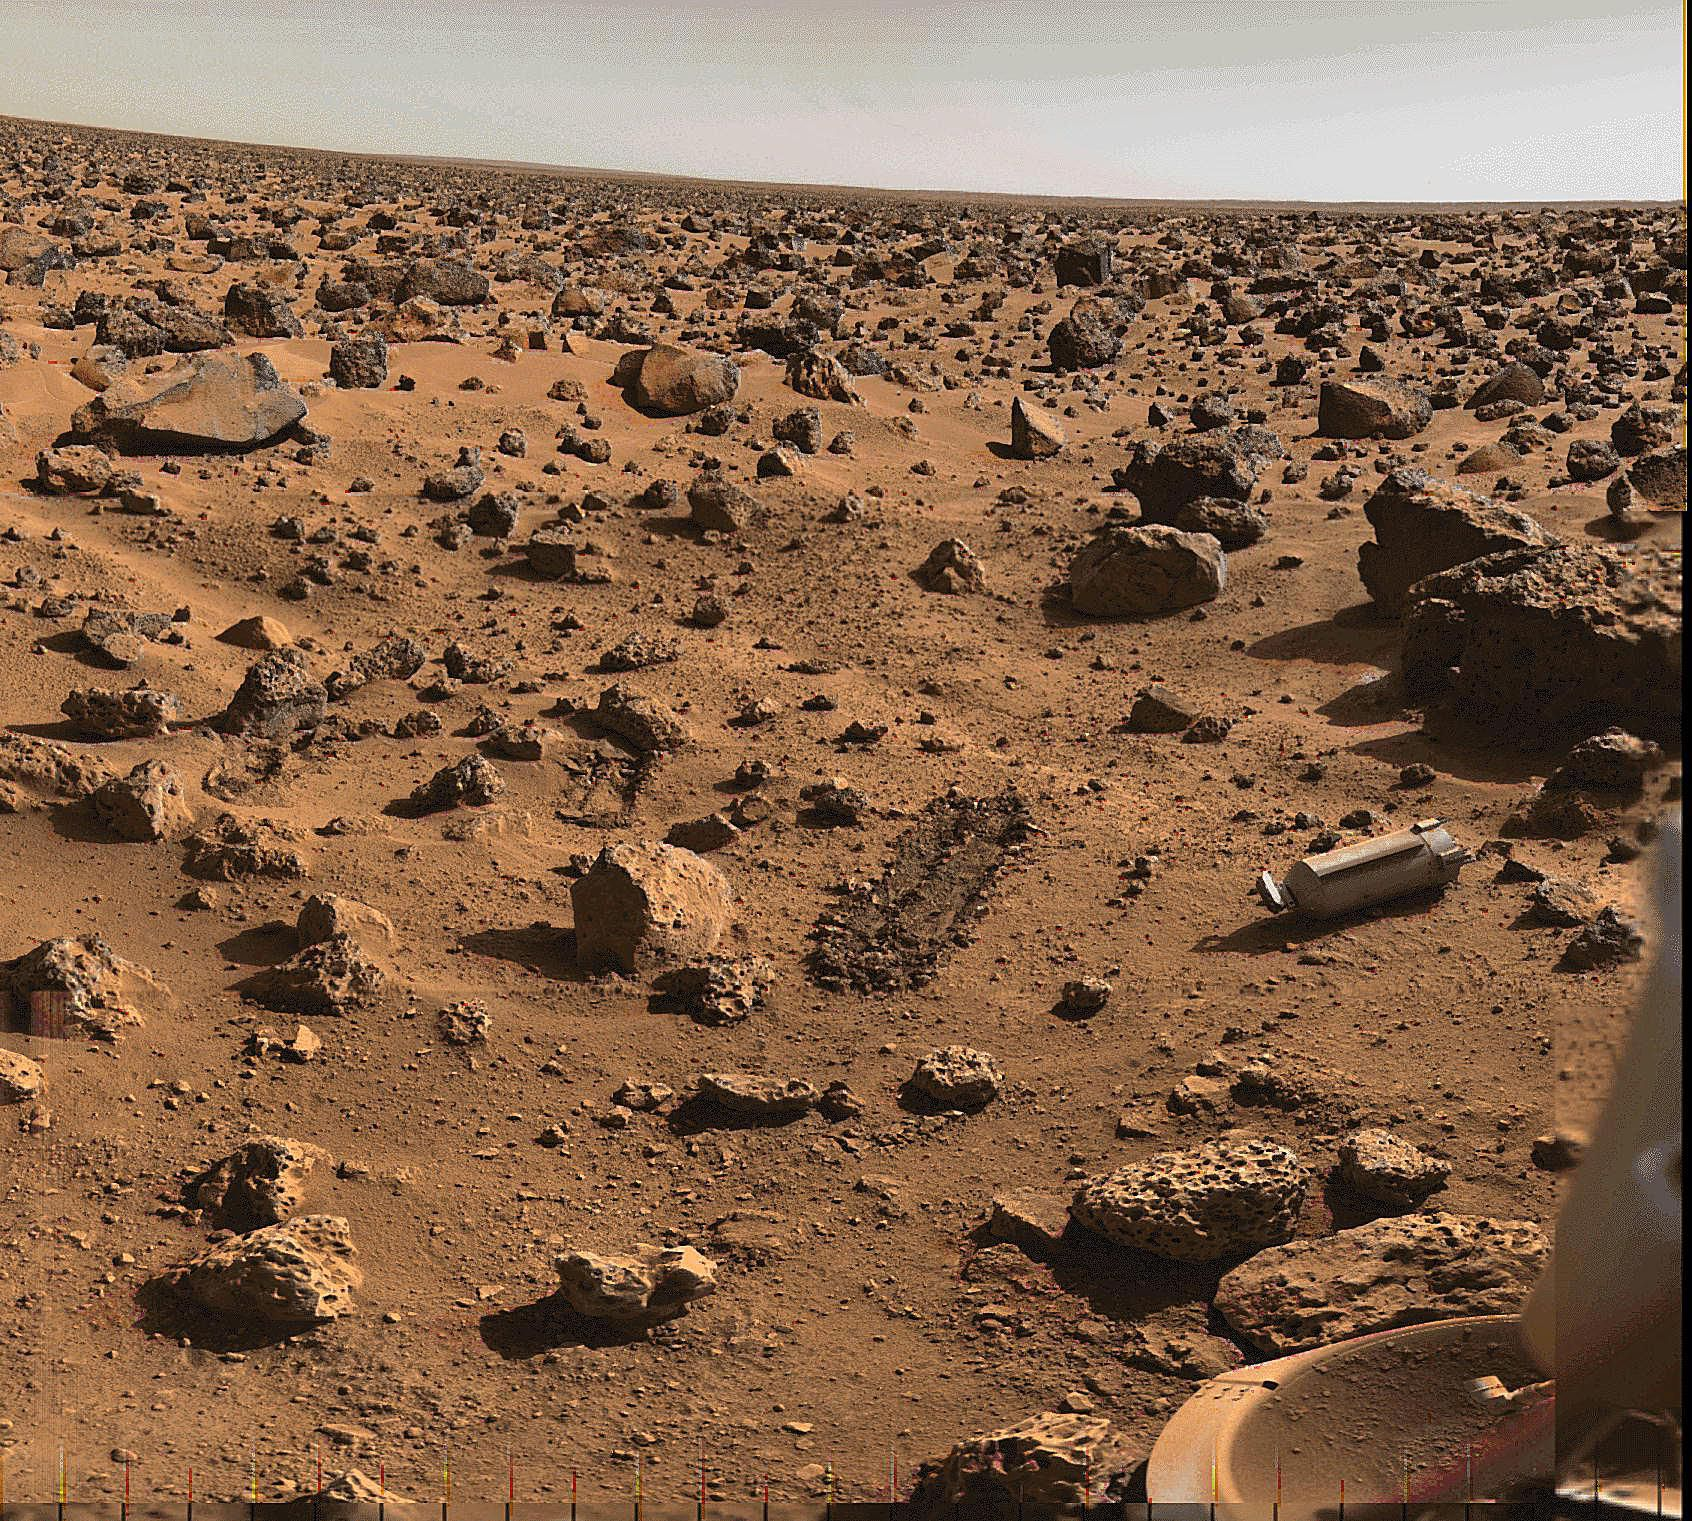 Pictures of Mars - Lander 2 Site